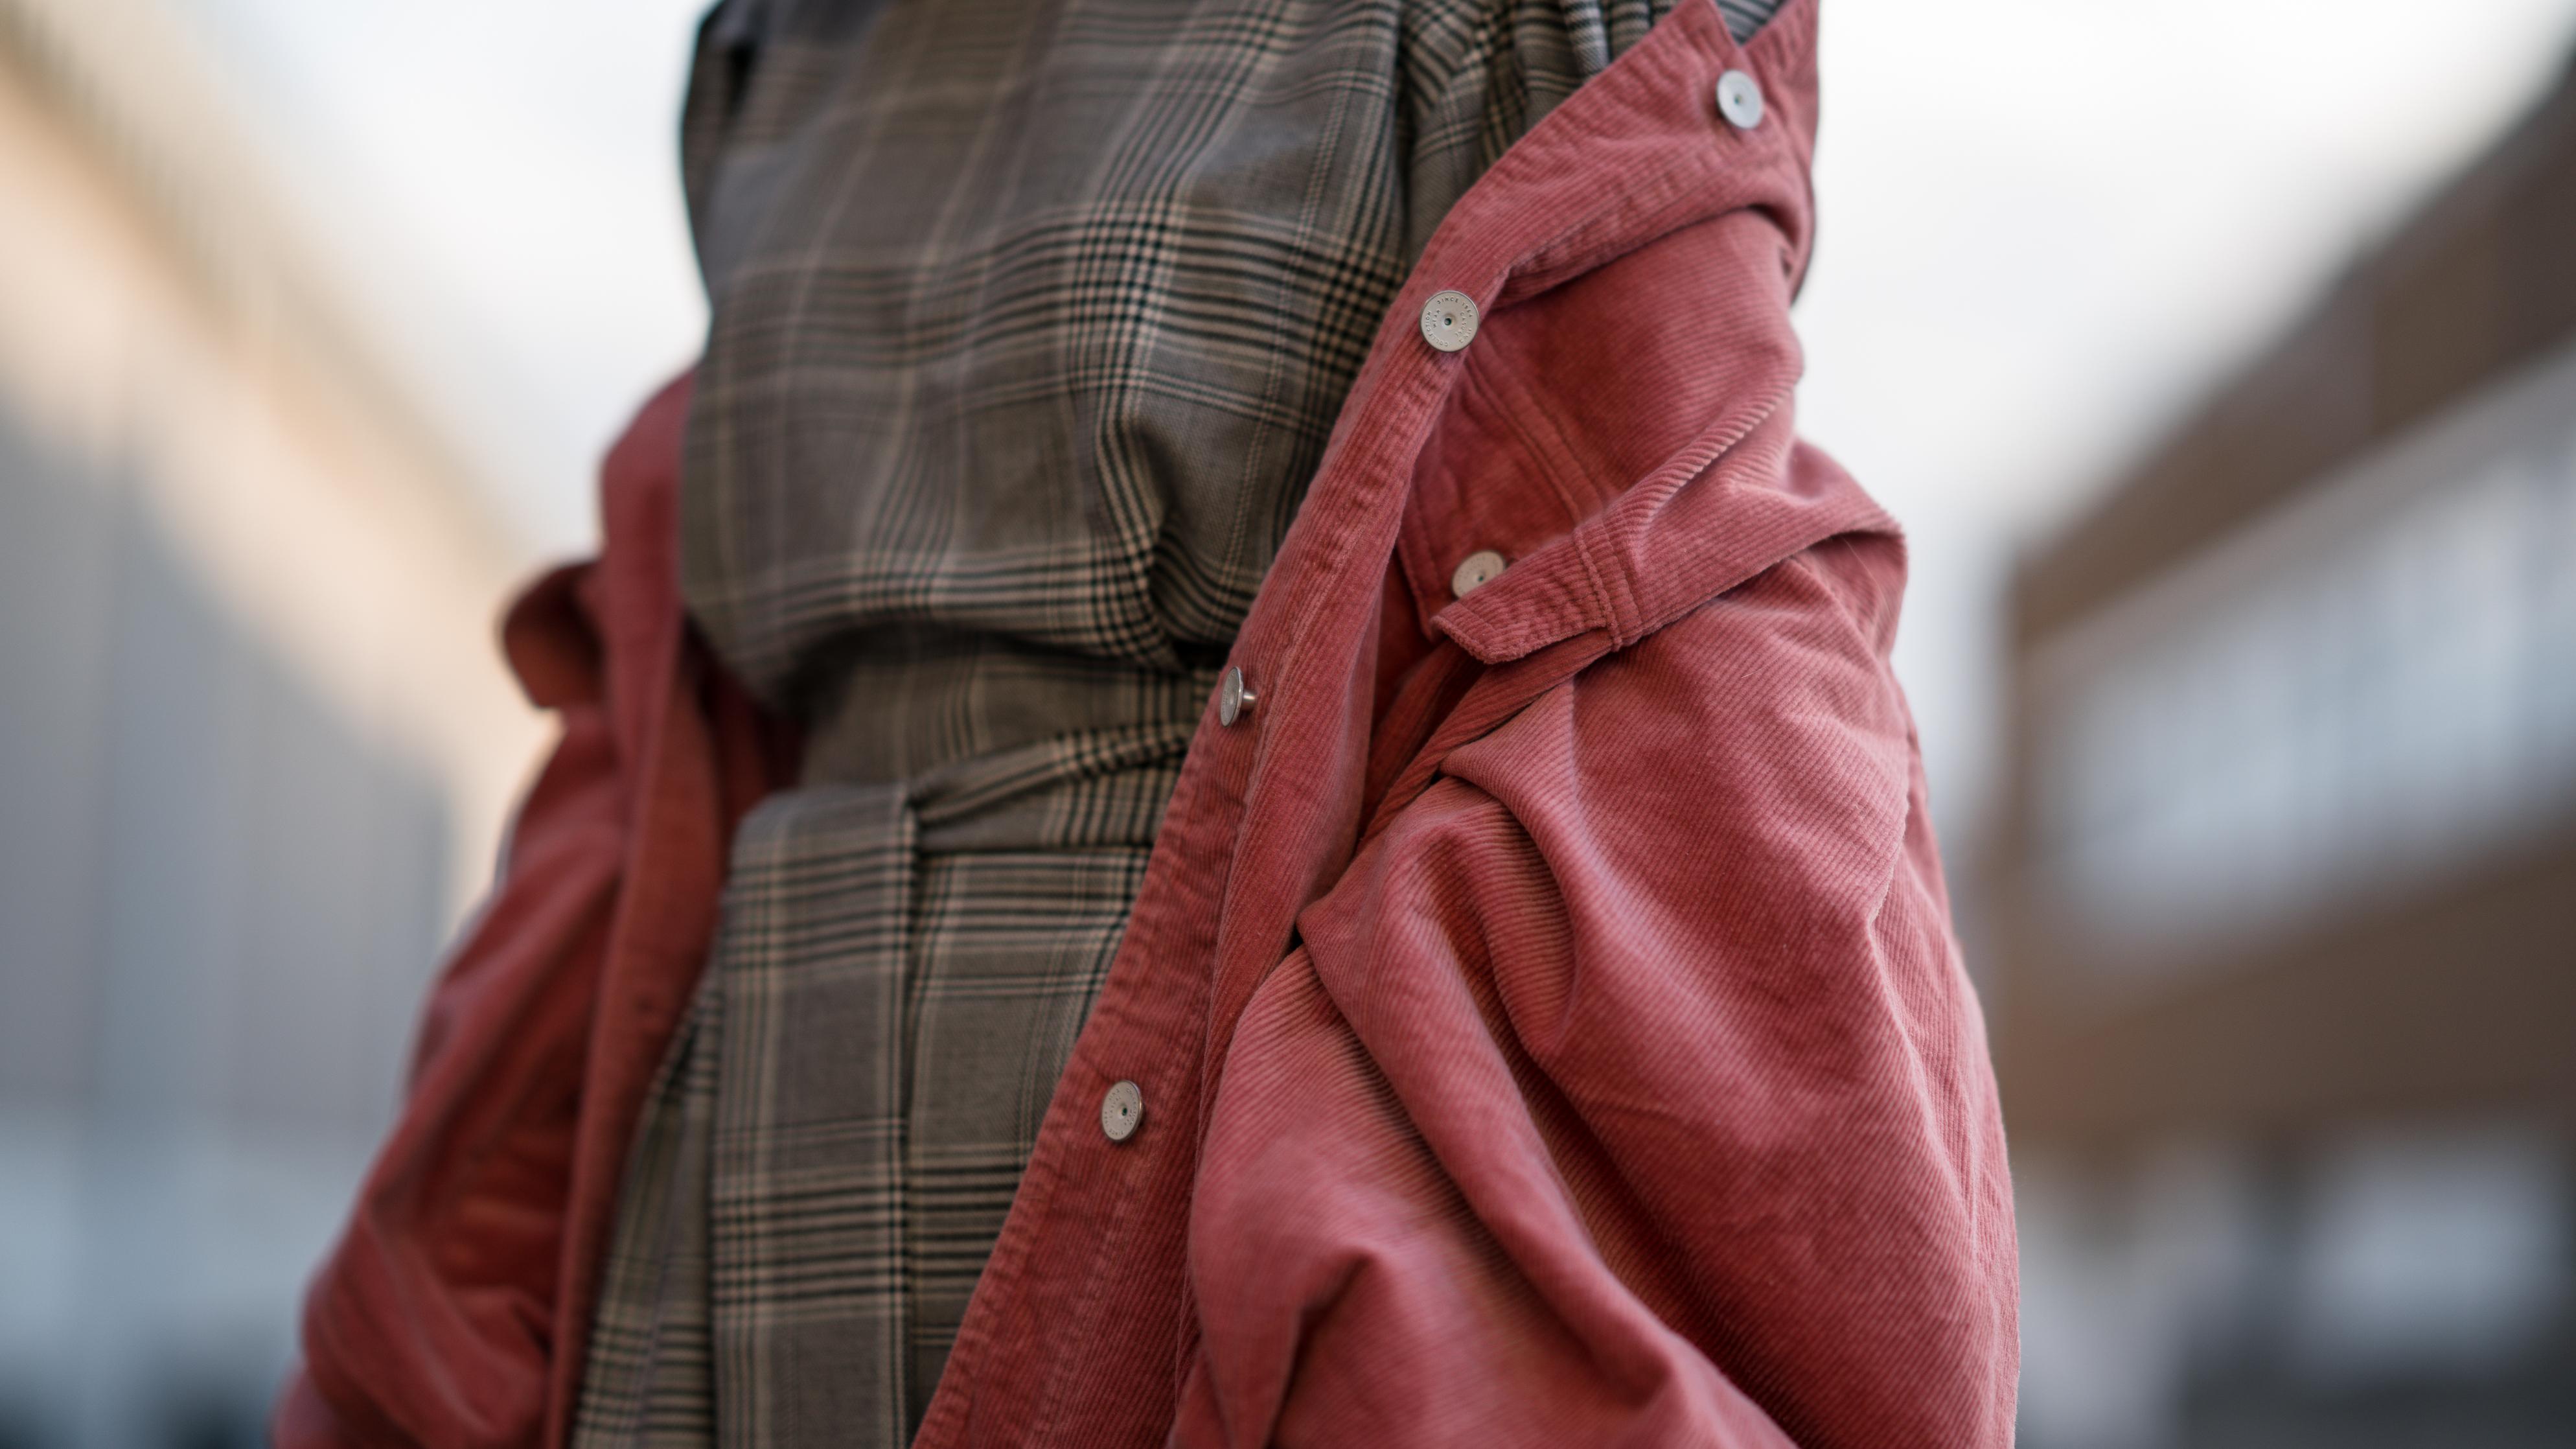 Pink Cord Jacket Glencheck Dress White Sneakers oversize Mango Cordjacke kariertes Kleid Zara Cord Trend Streetstyle Modeblog Sariety Fashionblogger Heidelberg_65